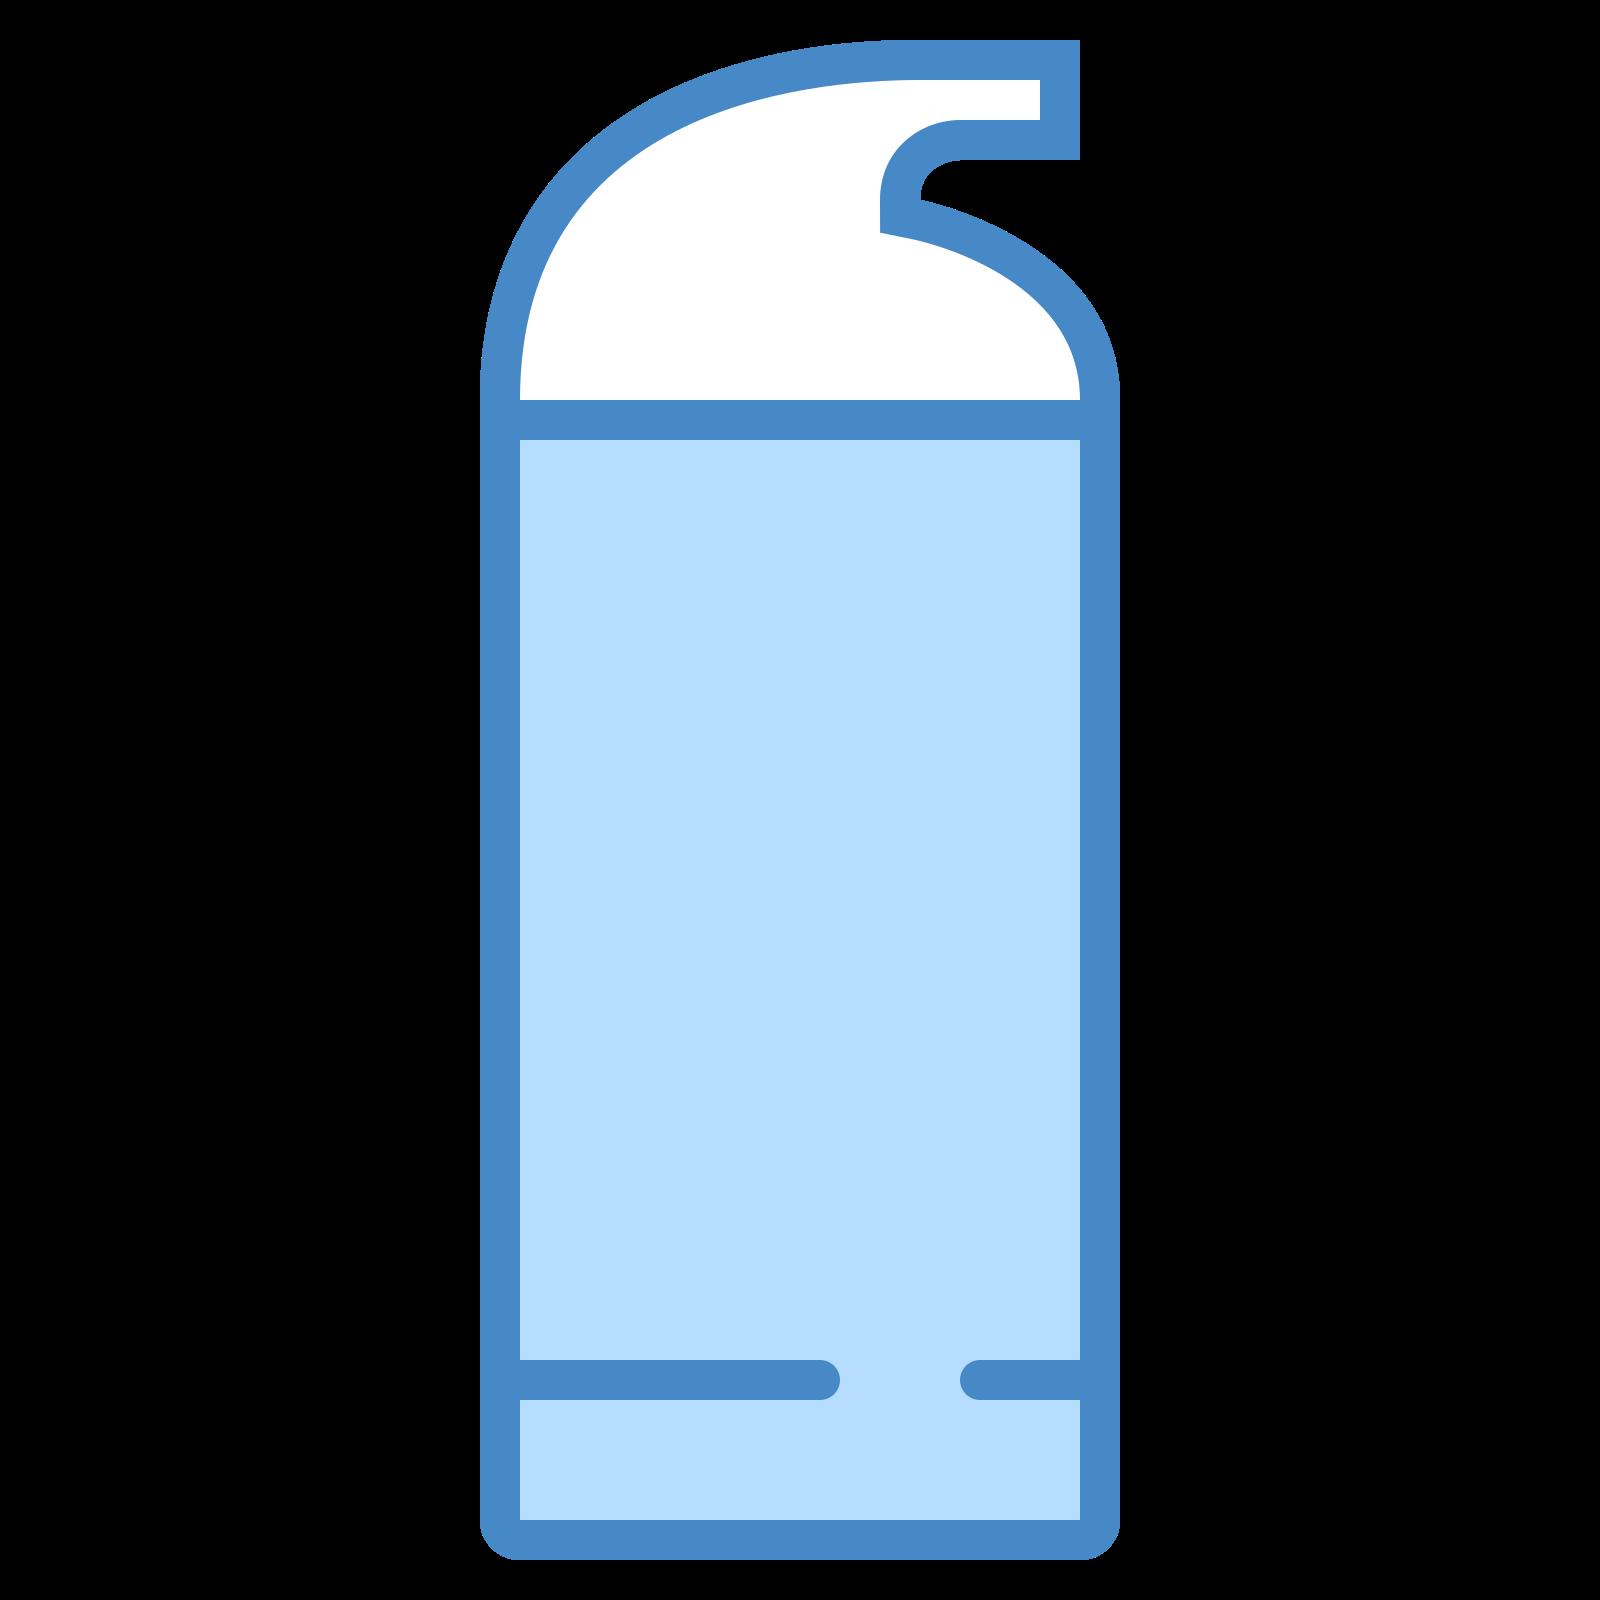 Крем для бритья icon